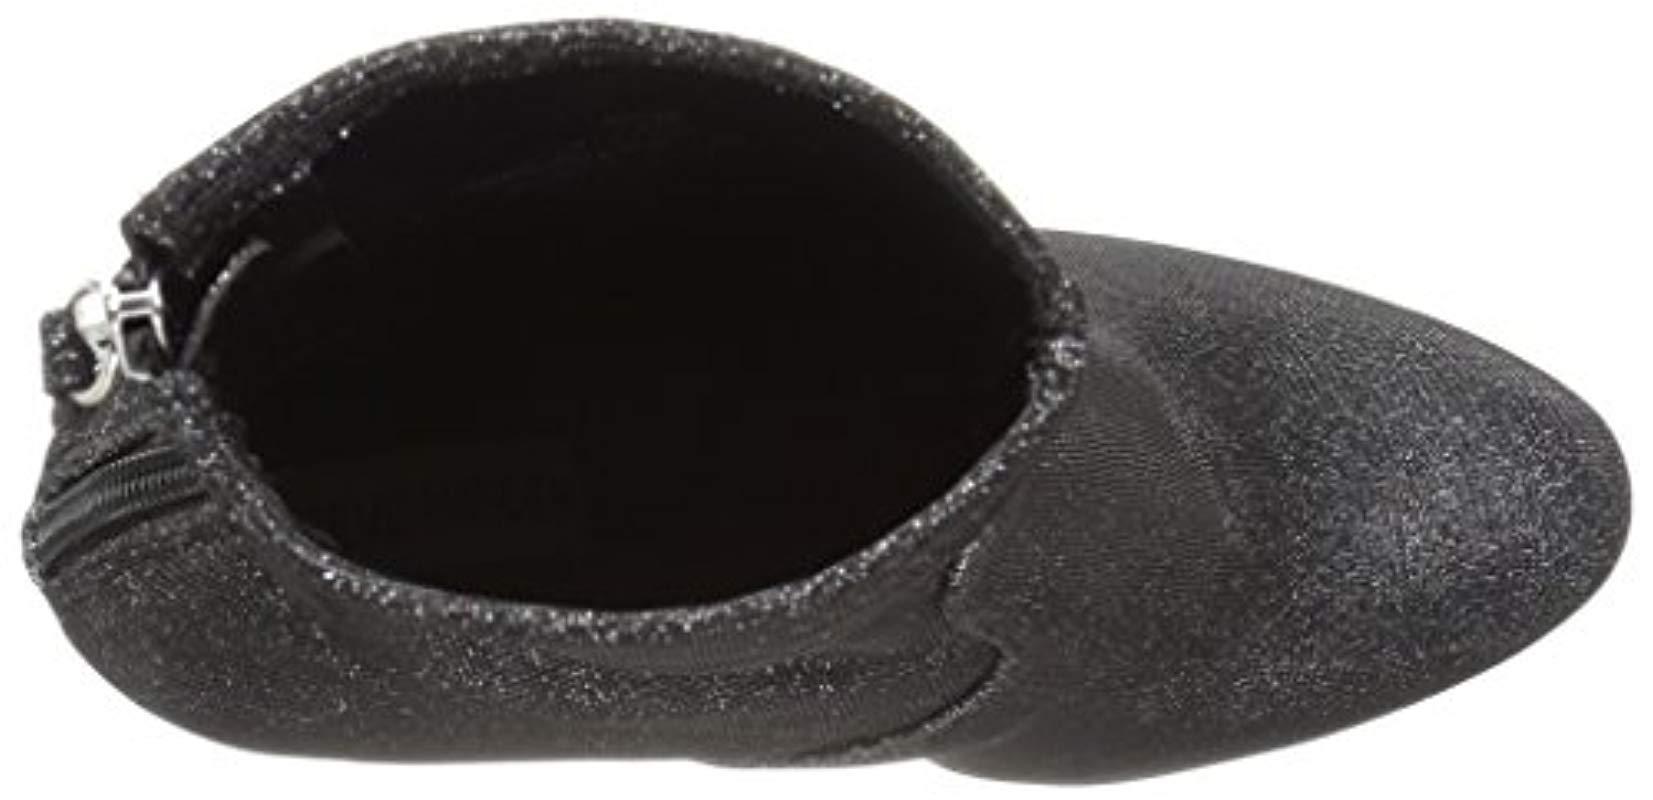 Steve Madden Leather S Brisk Brisk in Metallic